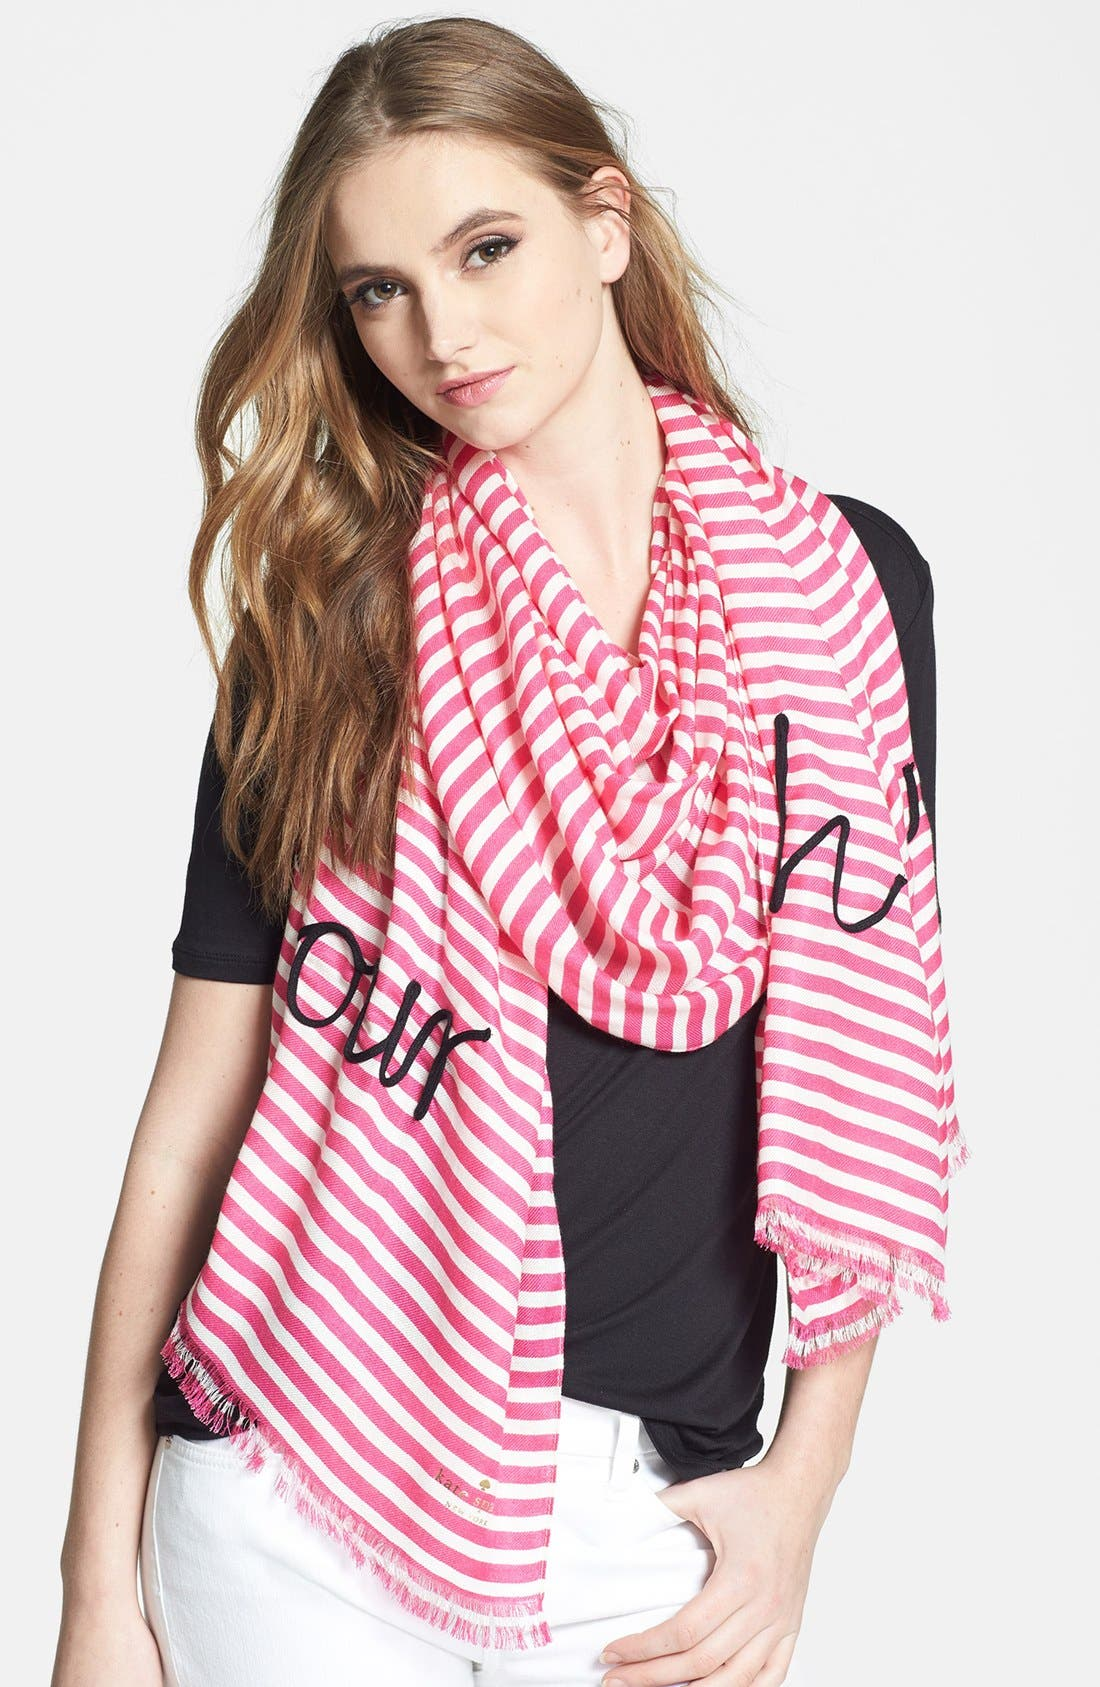 Alternate Image 1 Selected - kate spade new york 'ooh la la' embroidered scarf